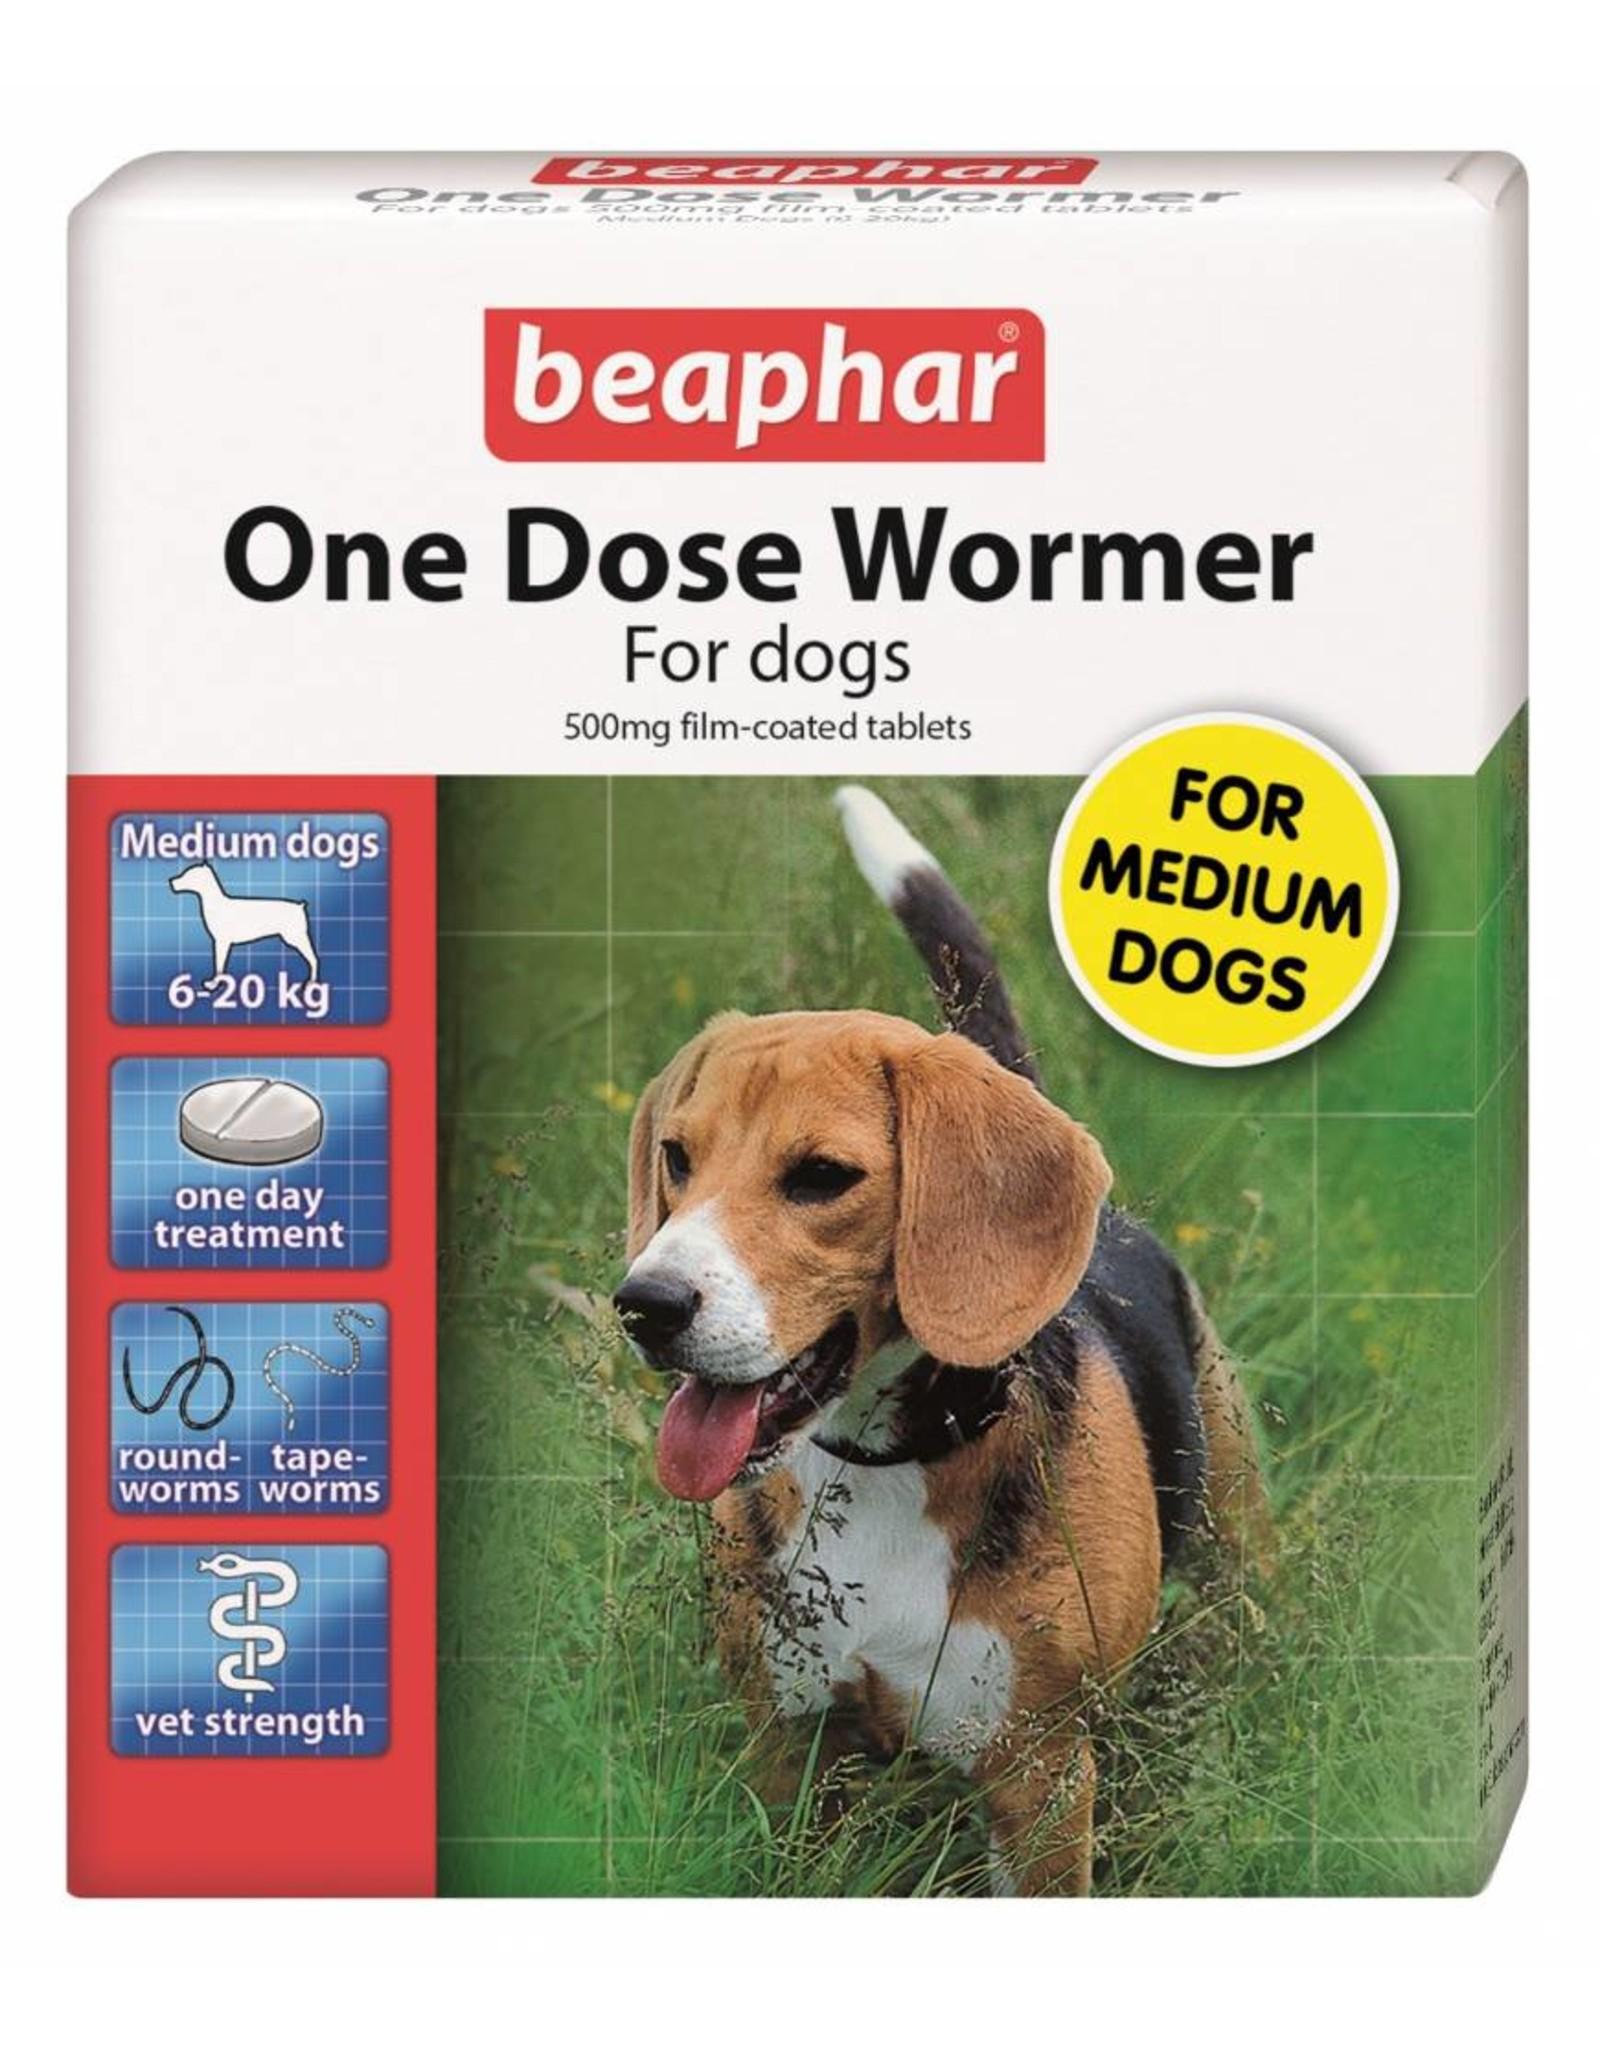 Beaphar One Dose Wormer for Dogs